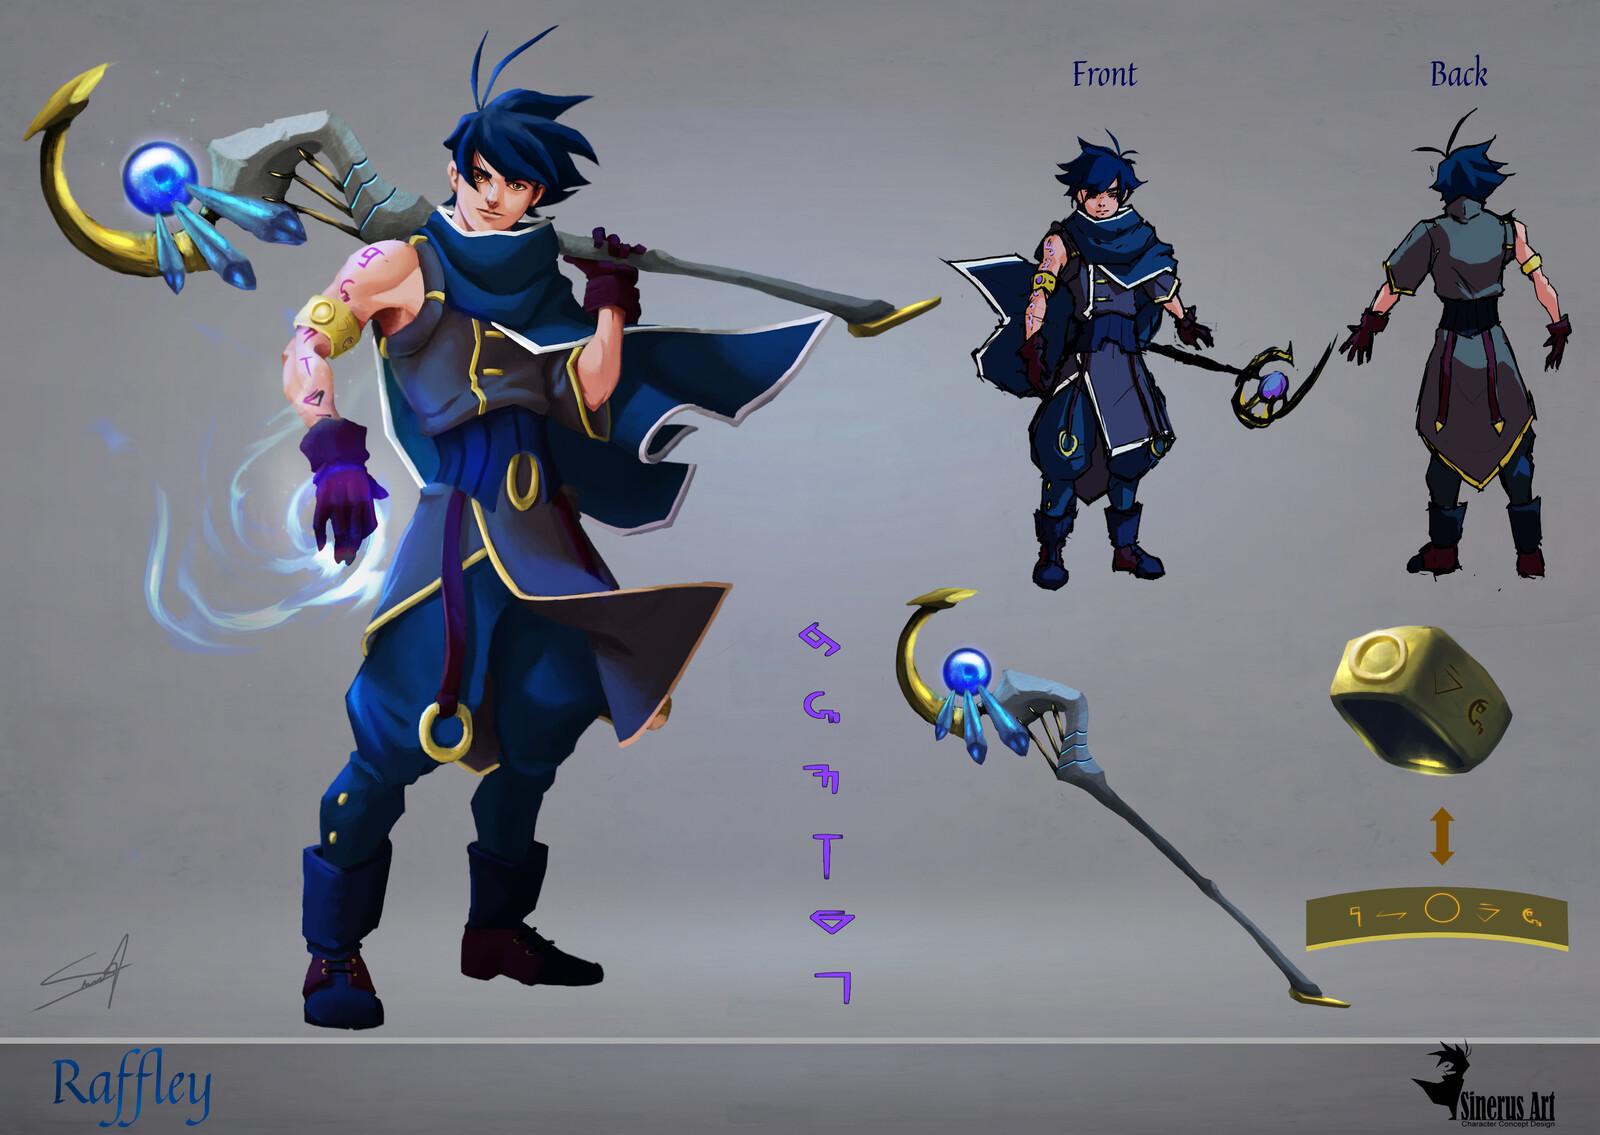 Character Sheet Raffley